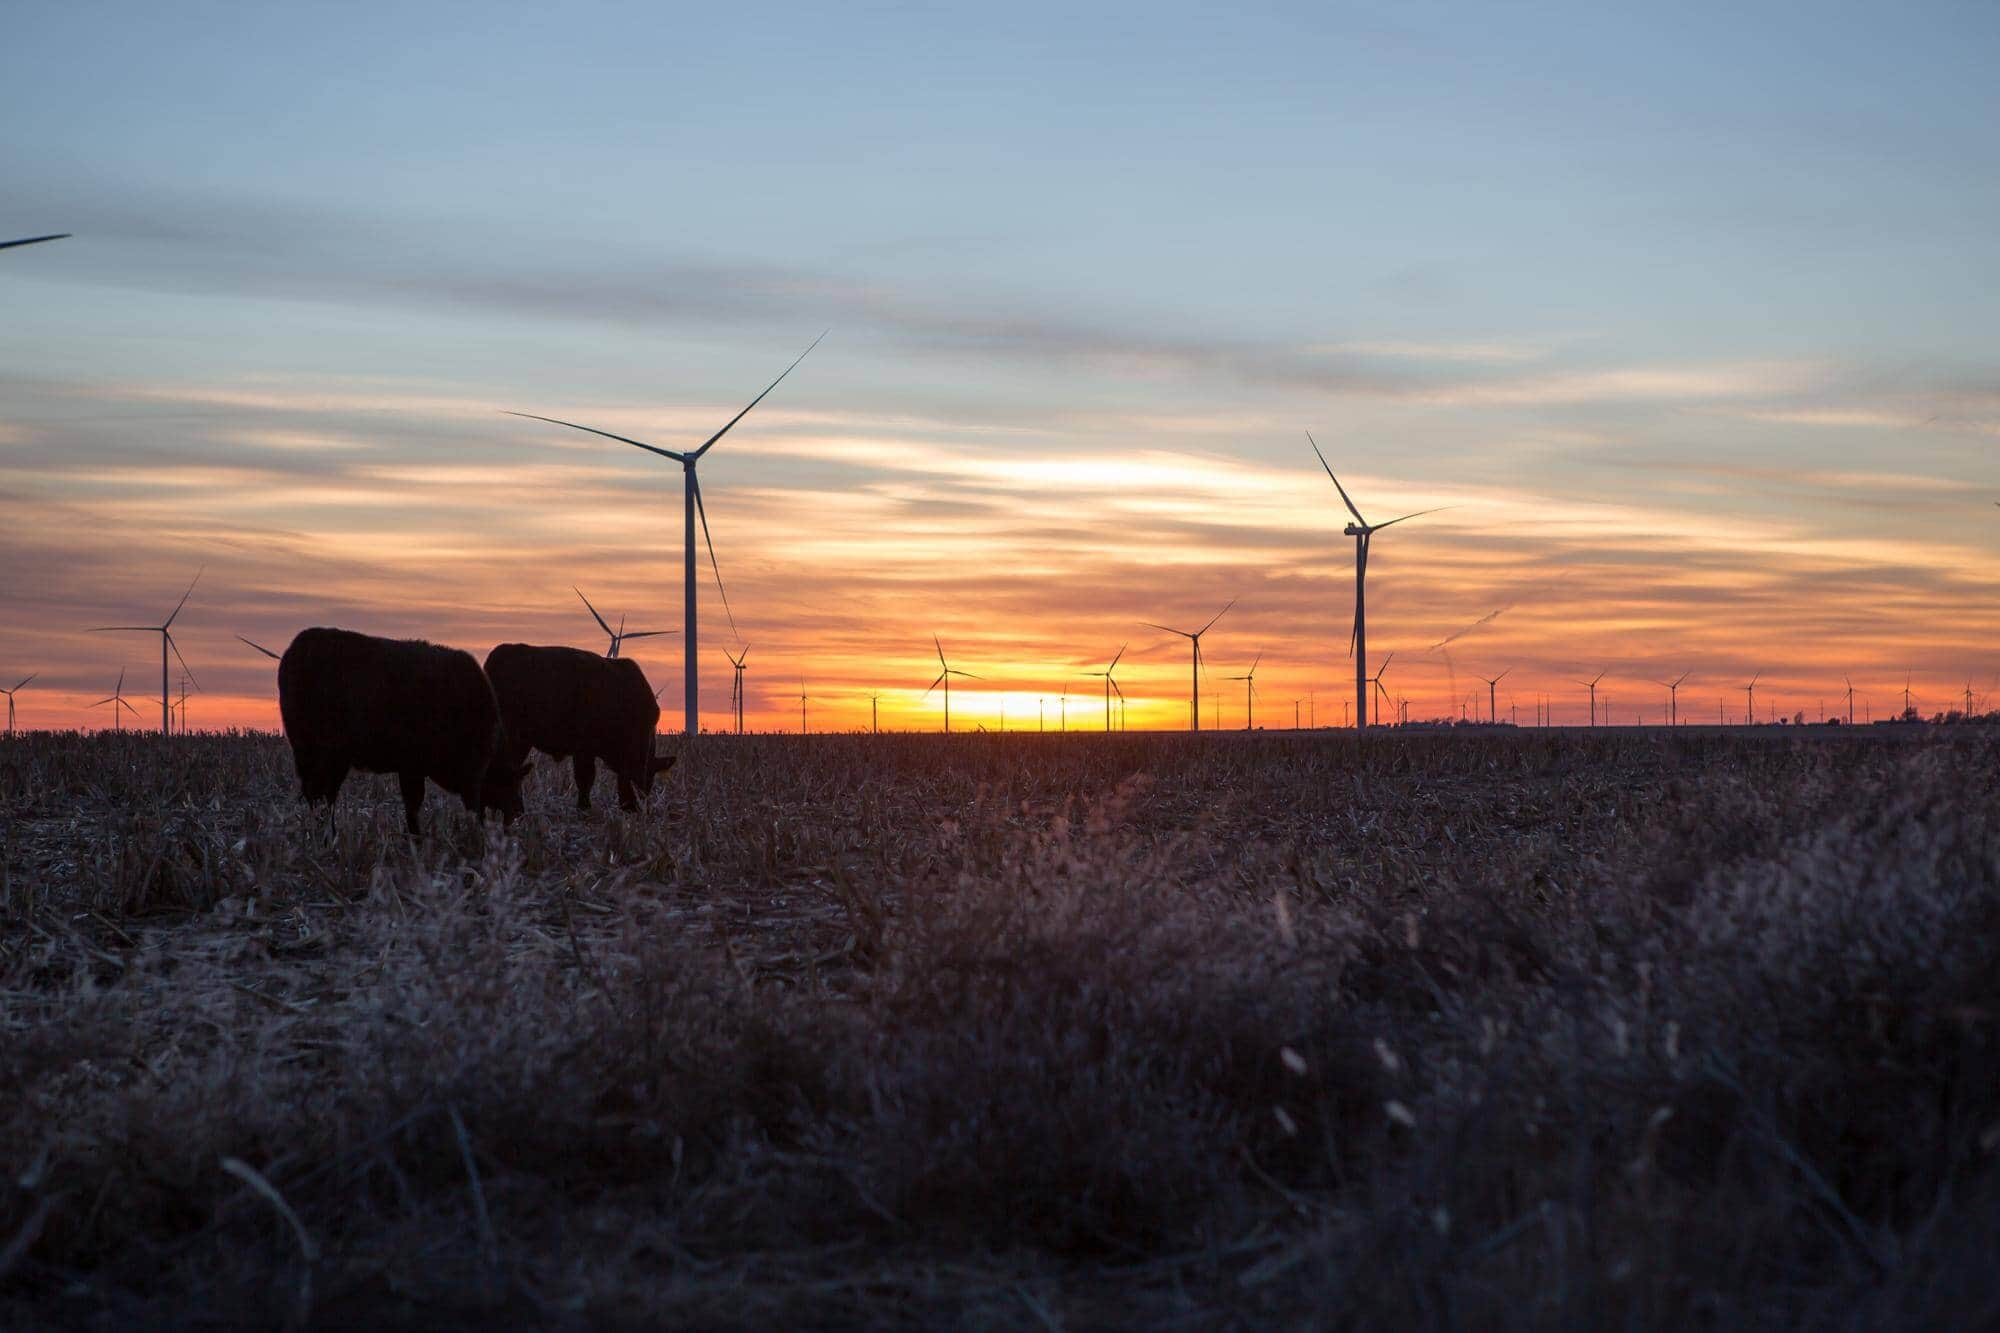 cimarron bend wind farm kansas